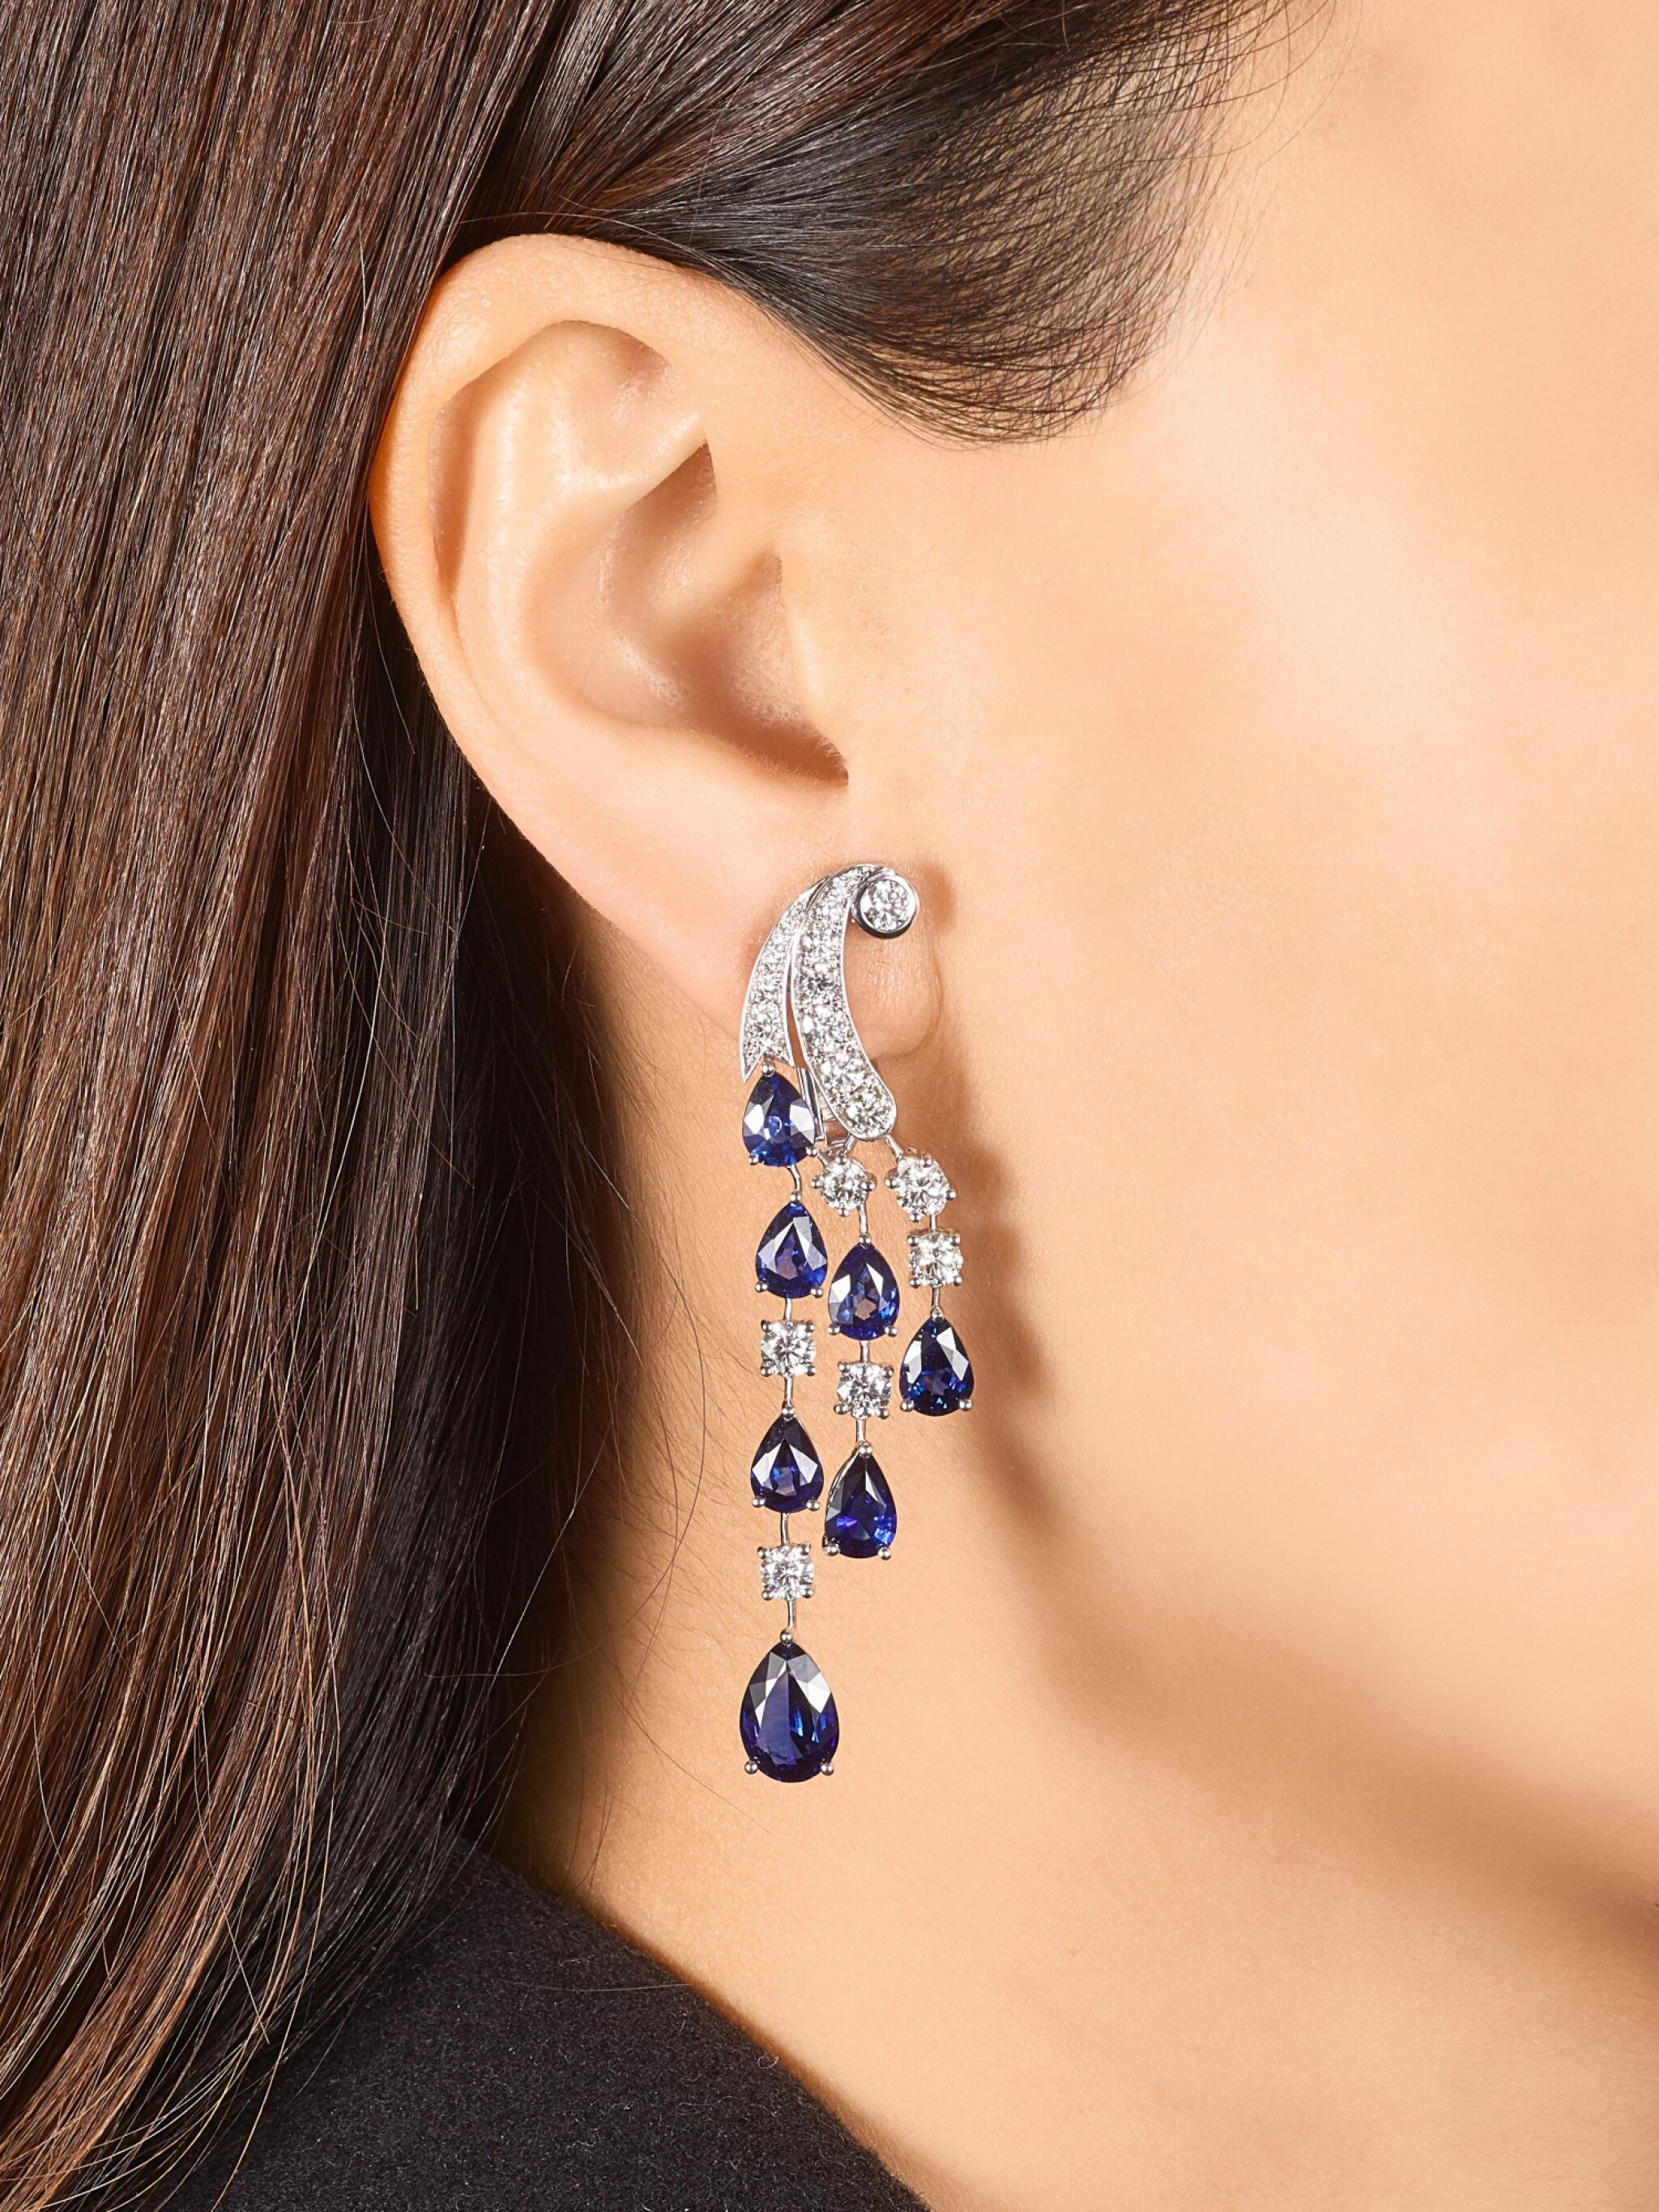 View full screen - View 1 of Lot 1065. Pair of Sapphire and Diamond Earrings | 格拉夫| 藍寶石 配 鑽石 耳墜一對 (藍寶石及鑽石共重約14.00及3.80克拉).